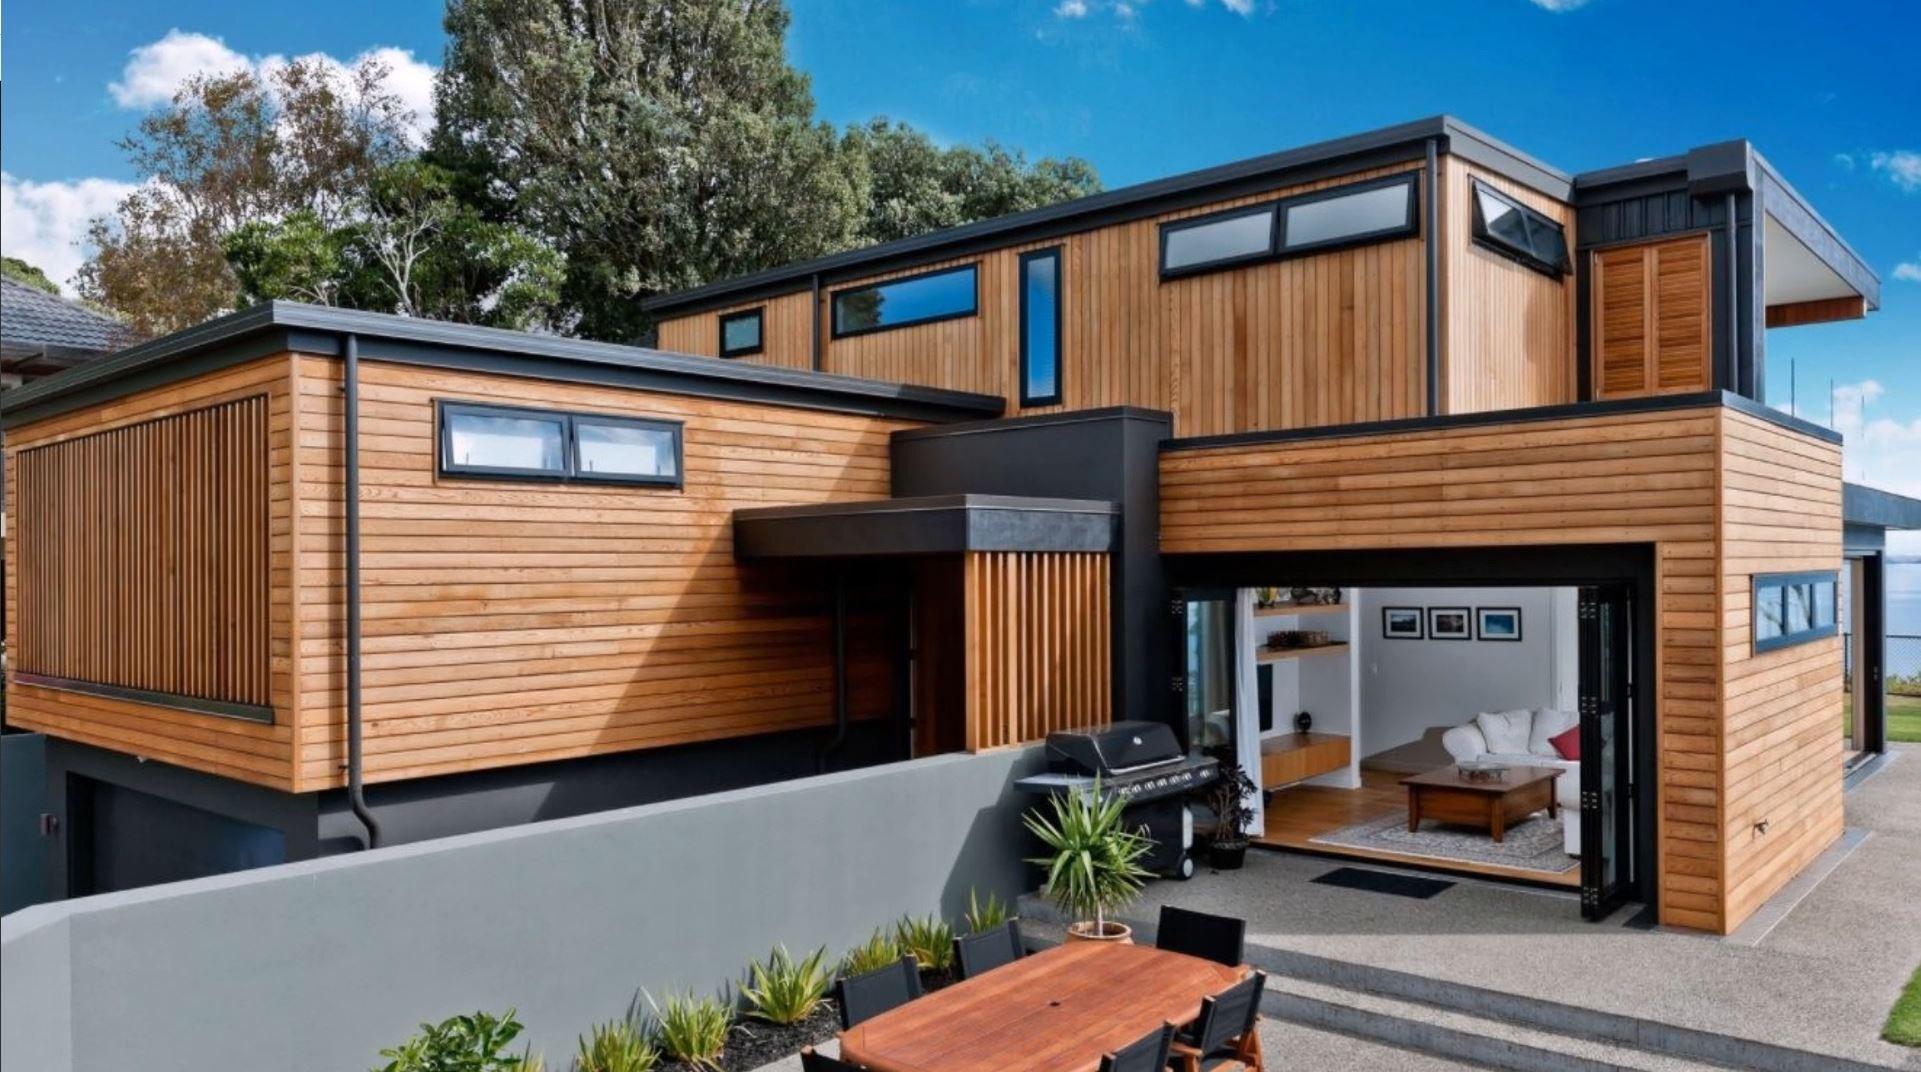 Fachadas de casas de madera - Modelos de casas rusticas ...